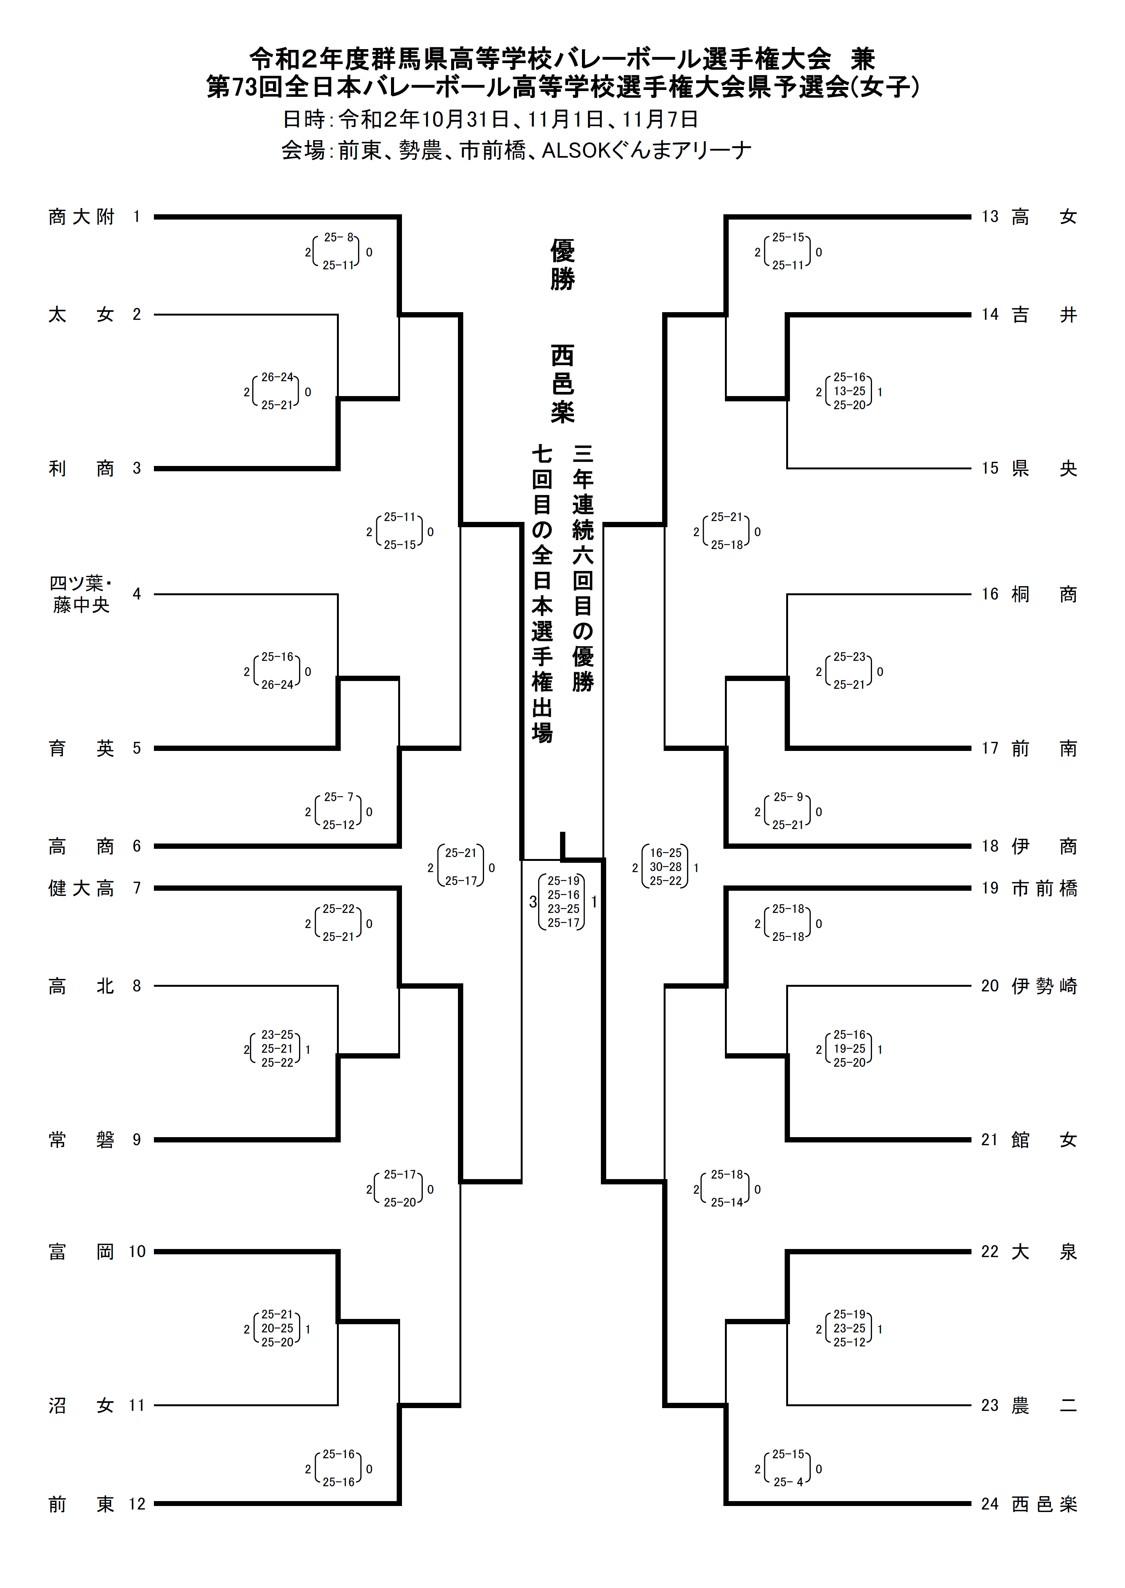 2020年度_全日本高校選手権_群馬予選_2,3次ラウンド_女子_最終結果